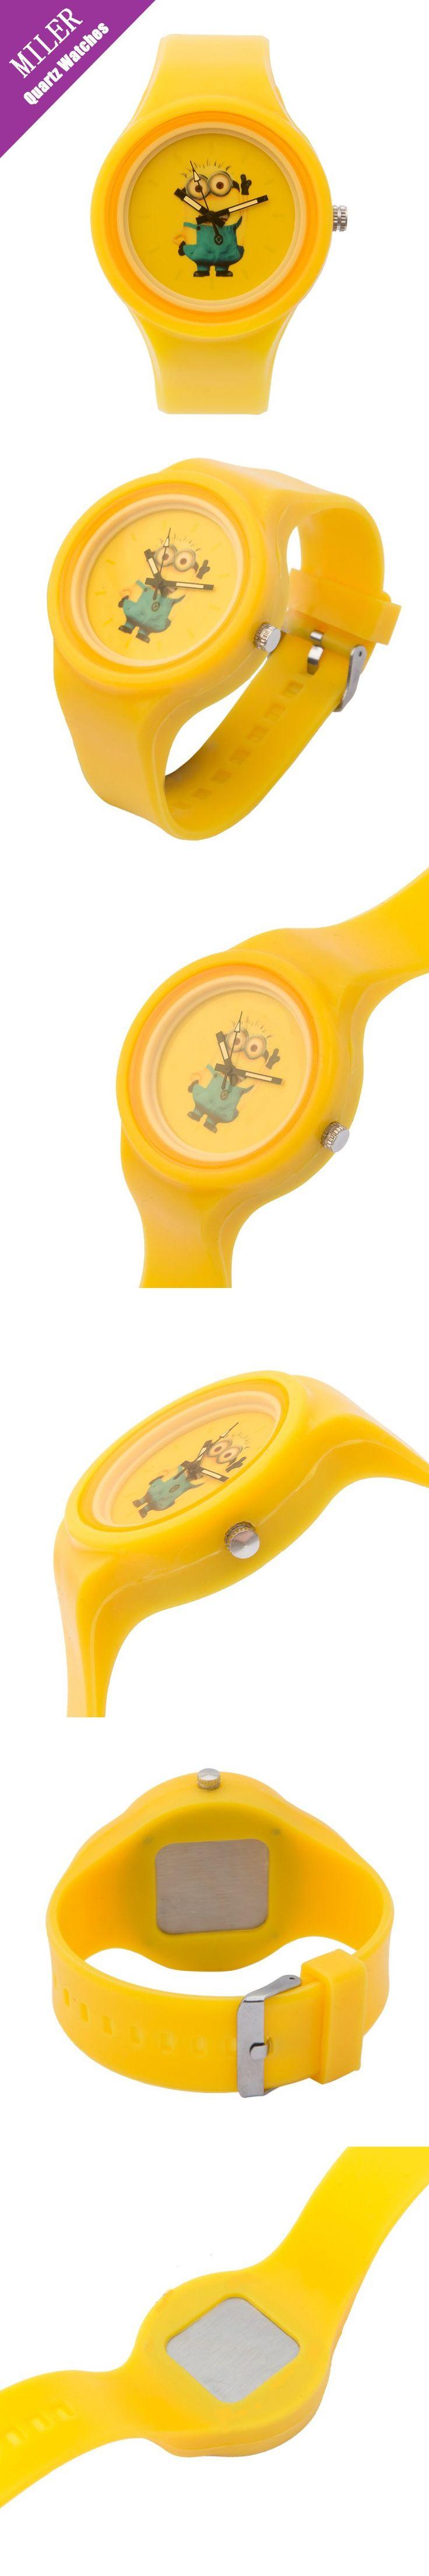 Kids Watches For Girls Boys 3D Eye Minions Watch Cute Cartoon Silicon Quartz Wristwatches Children Clock Orologio Montre Enfant $5.96